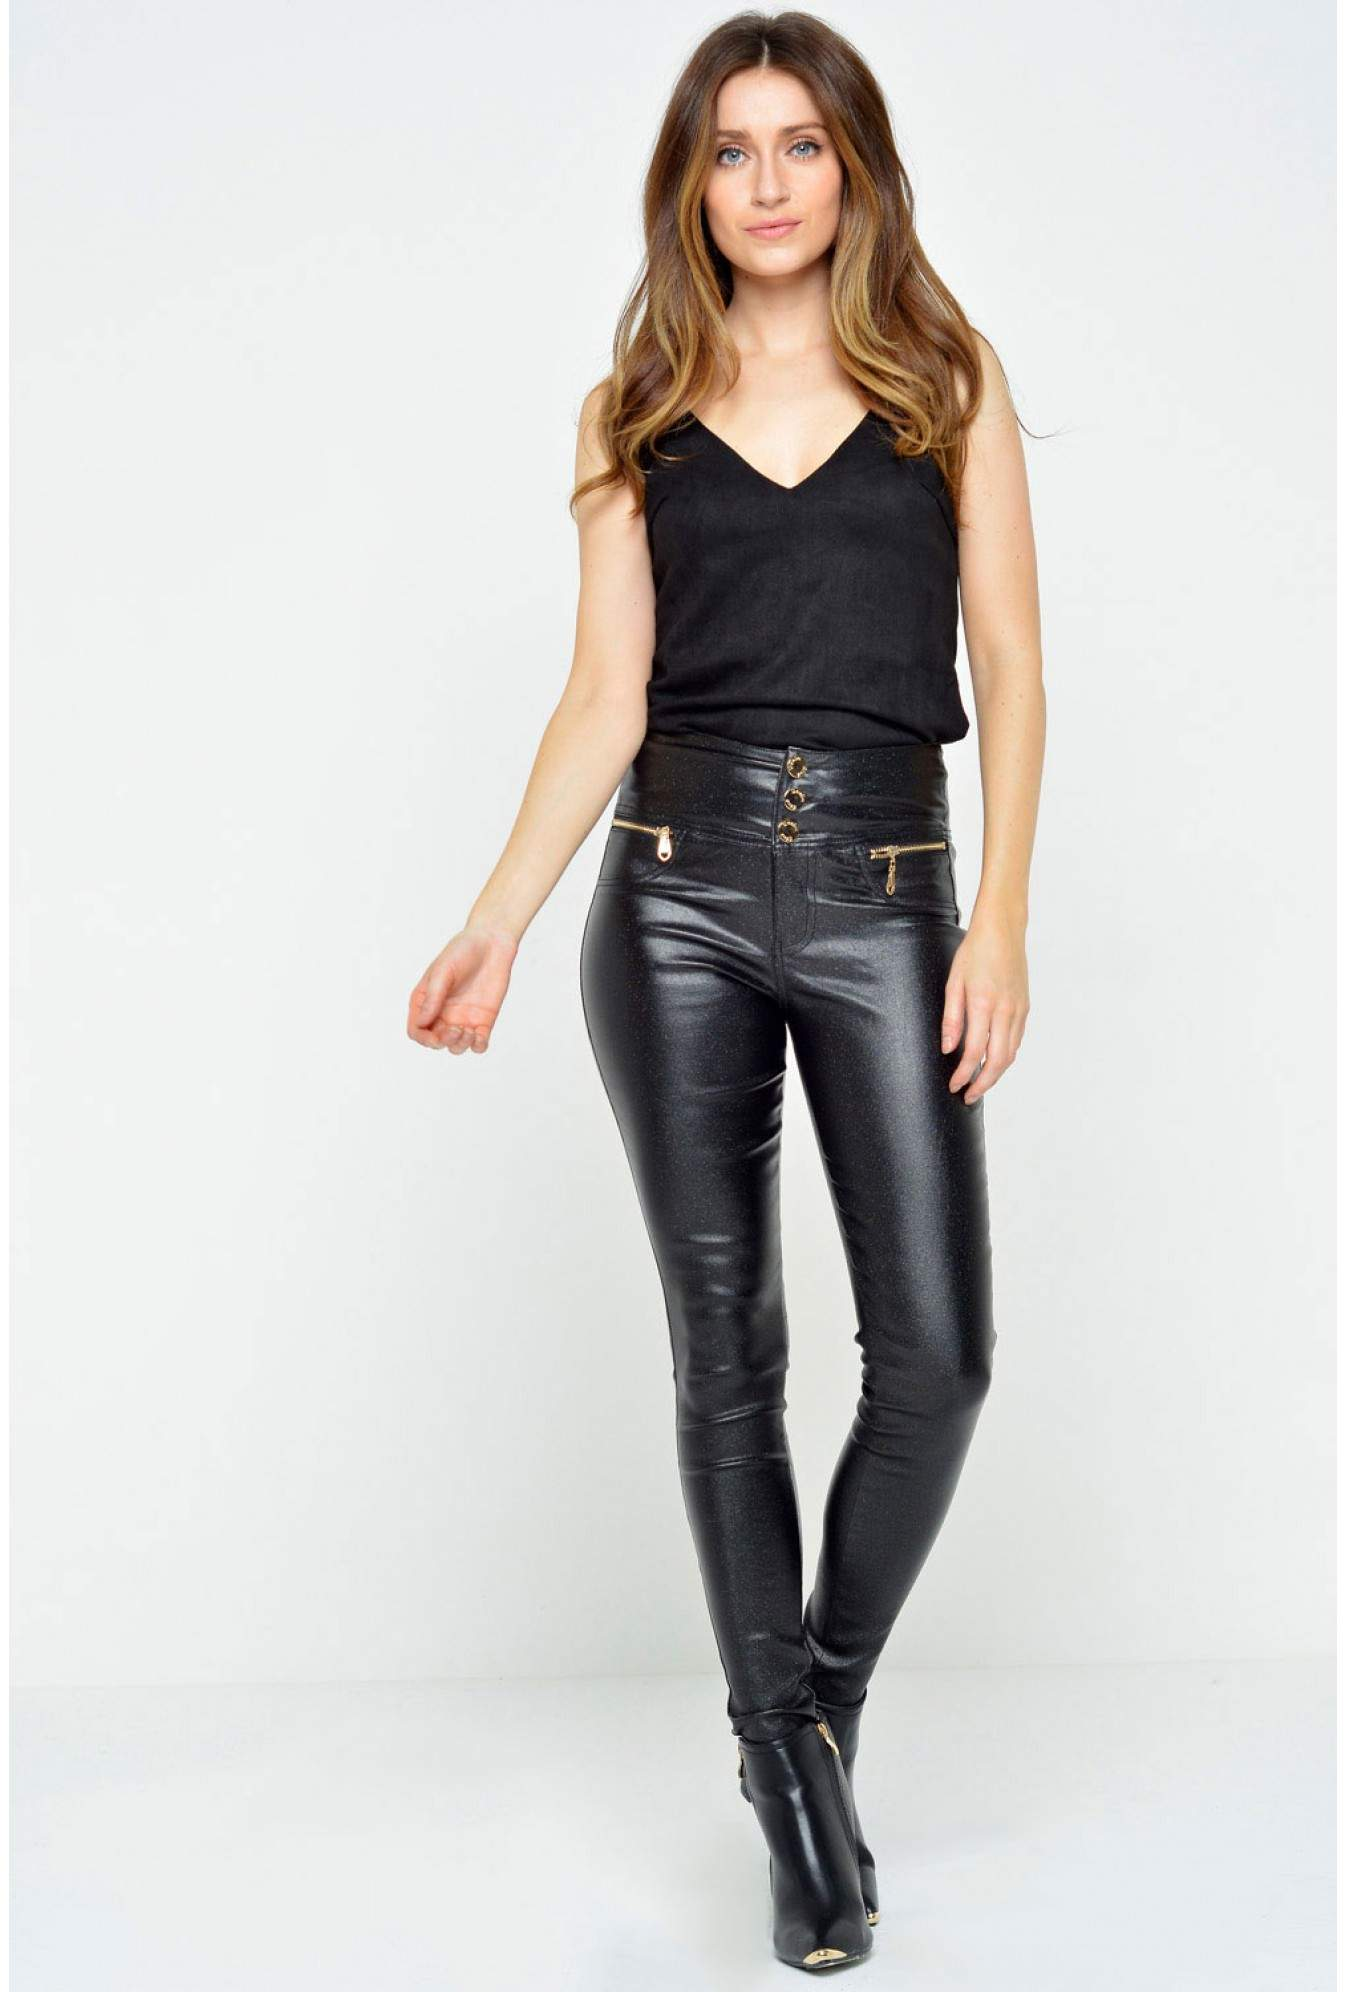 1686572ea8a6e More Views. Florence High Waisted Wax Look Trousers in Black Glitter. Denim  Club